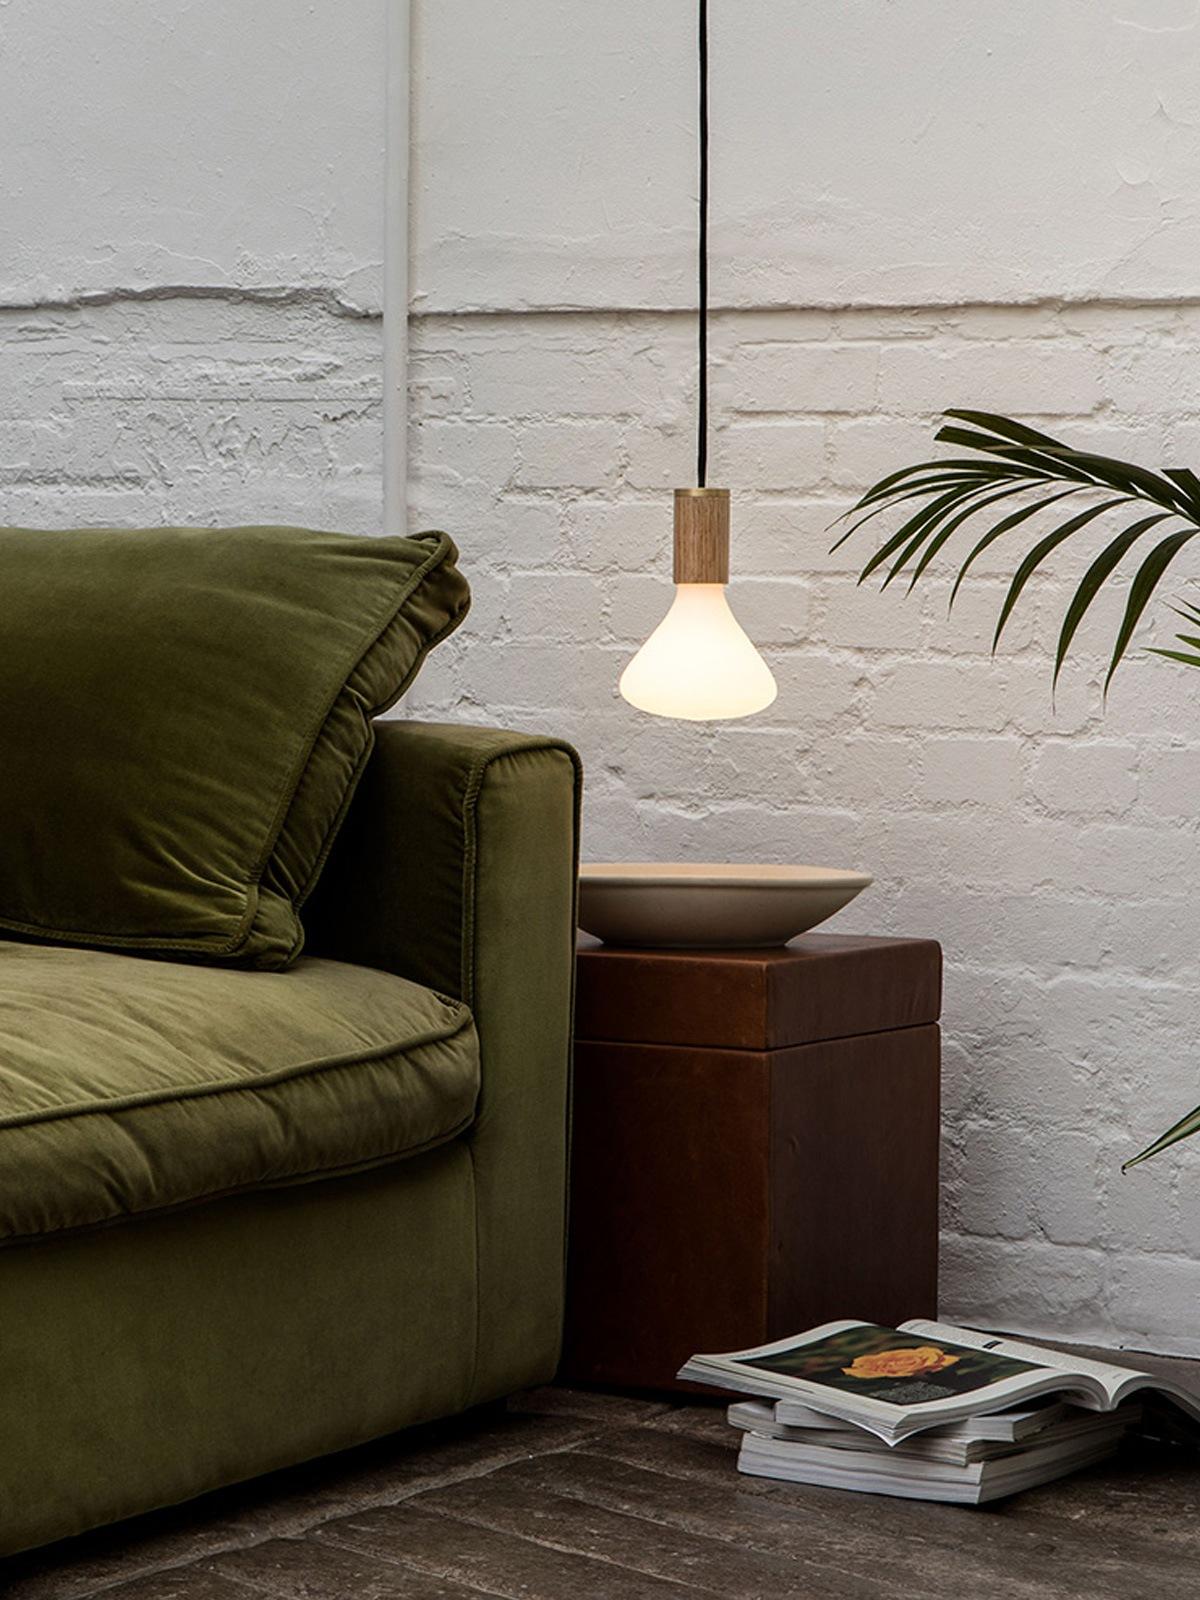 Fassungen Pendant Light Holz Tala DesignOrt Berlin Onlineshop Lampen